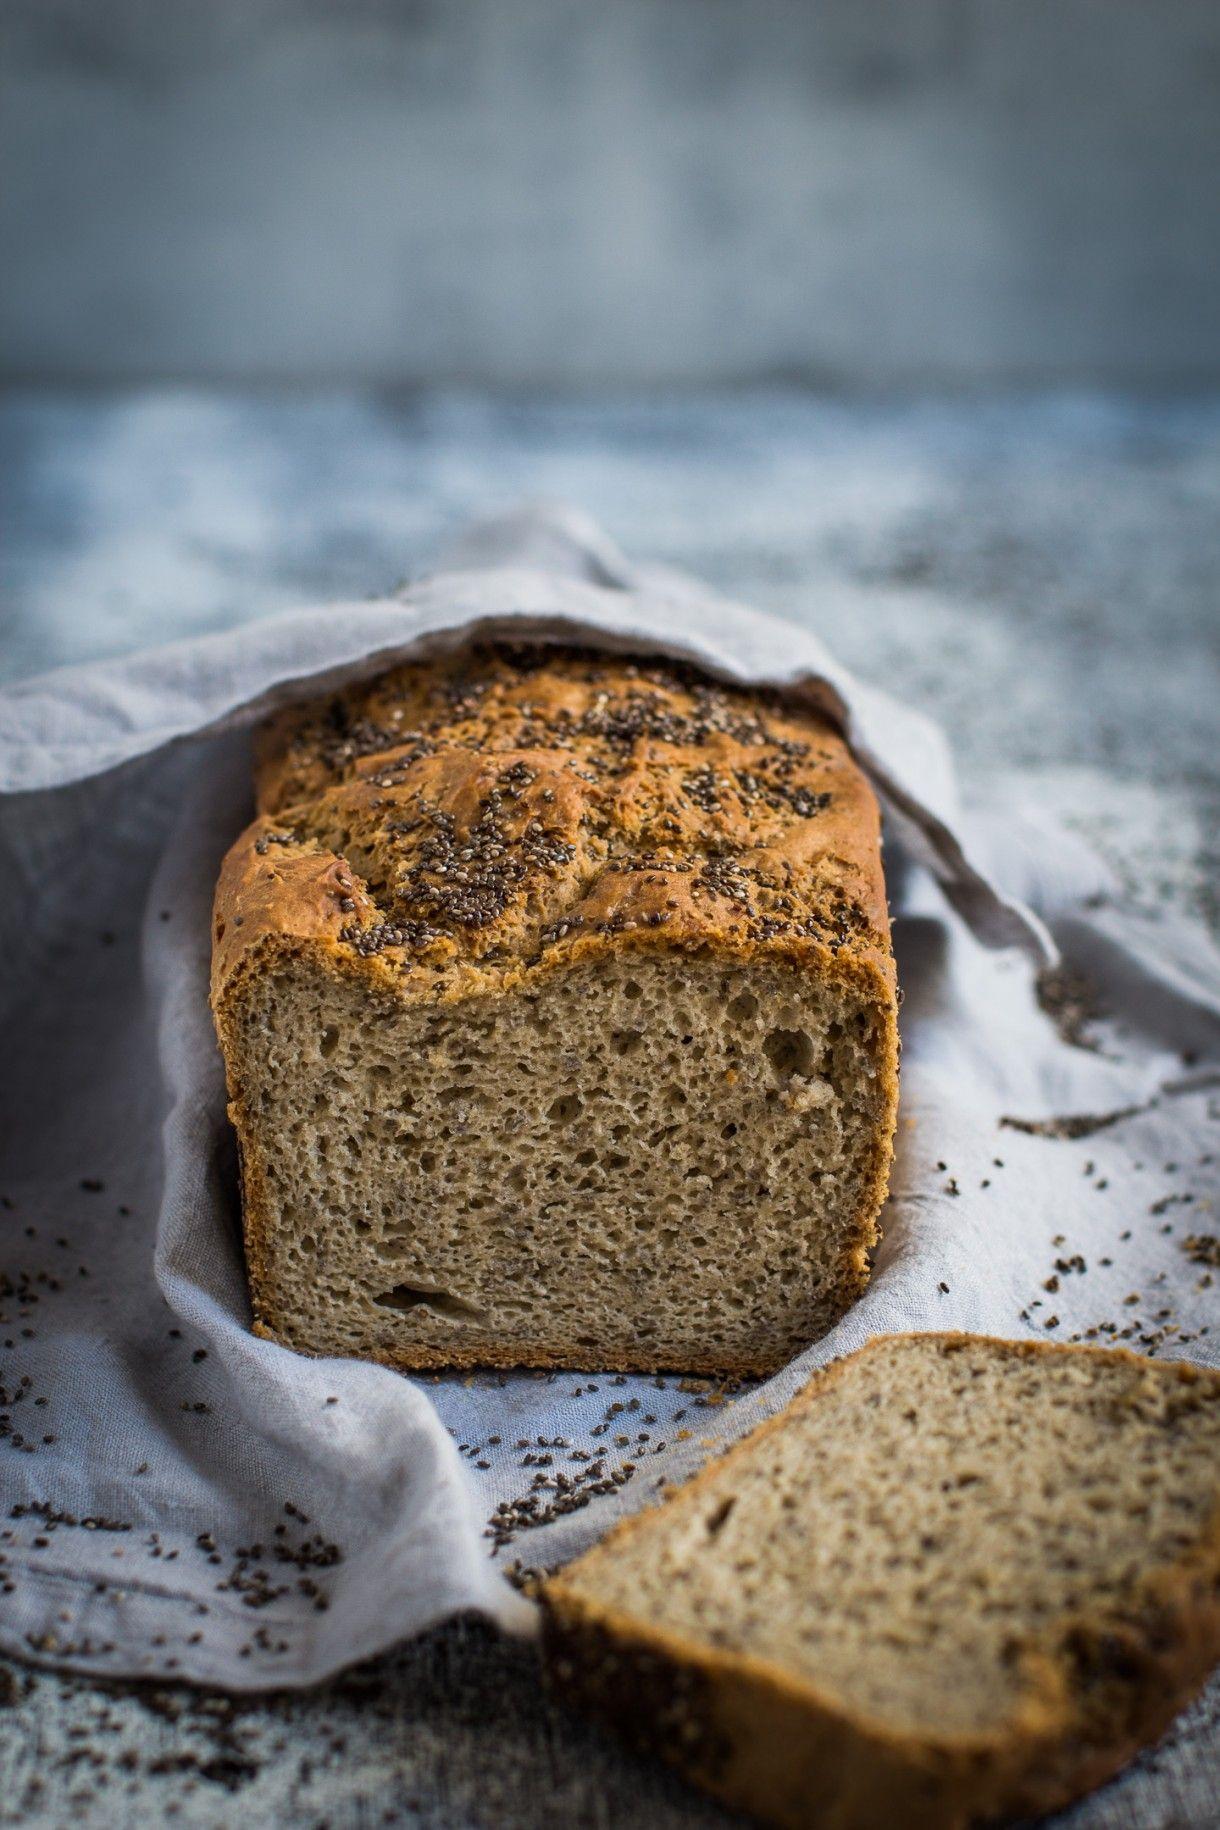 High Fibre Buckwheat And Chia Gluten Free Bread Recipe Gluten Free Recipes Bread Gluten Free Bread Buckwheat Flour Recipes